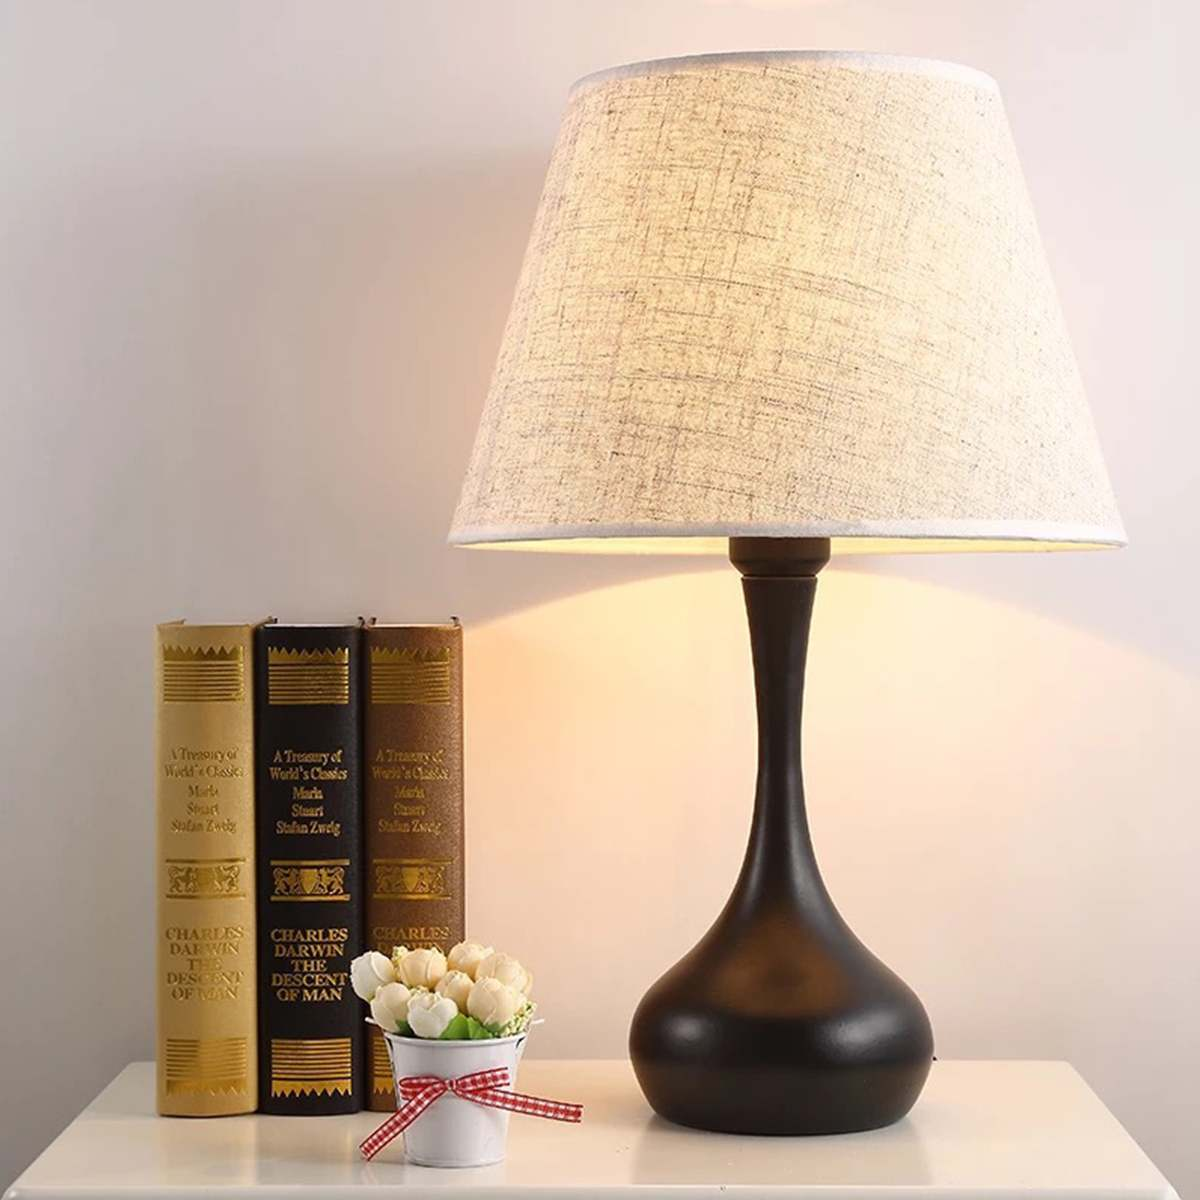 Nordic Modern LED Bedside Lamp Bed Lamp For Living Room Bedroom Decorative Lighting Desk Lamp Table Art Decor Night Light